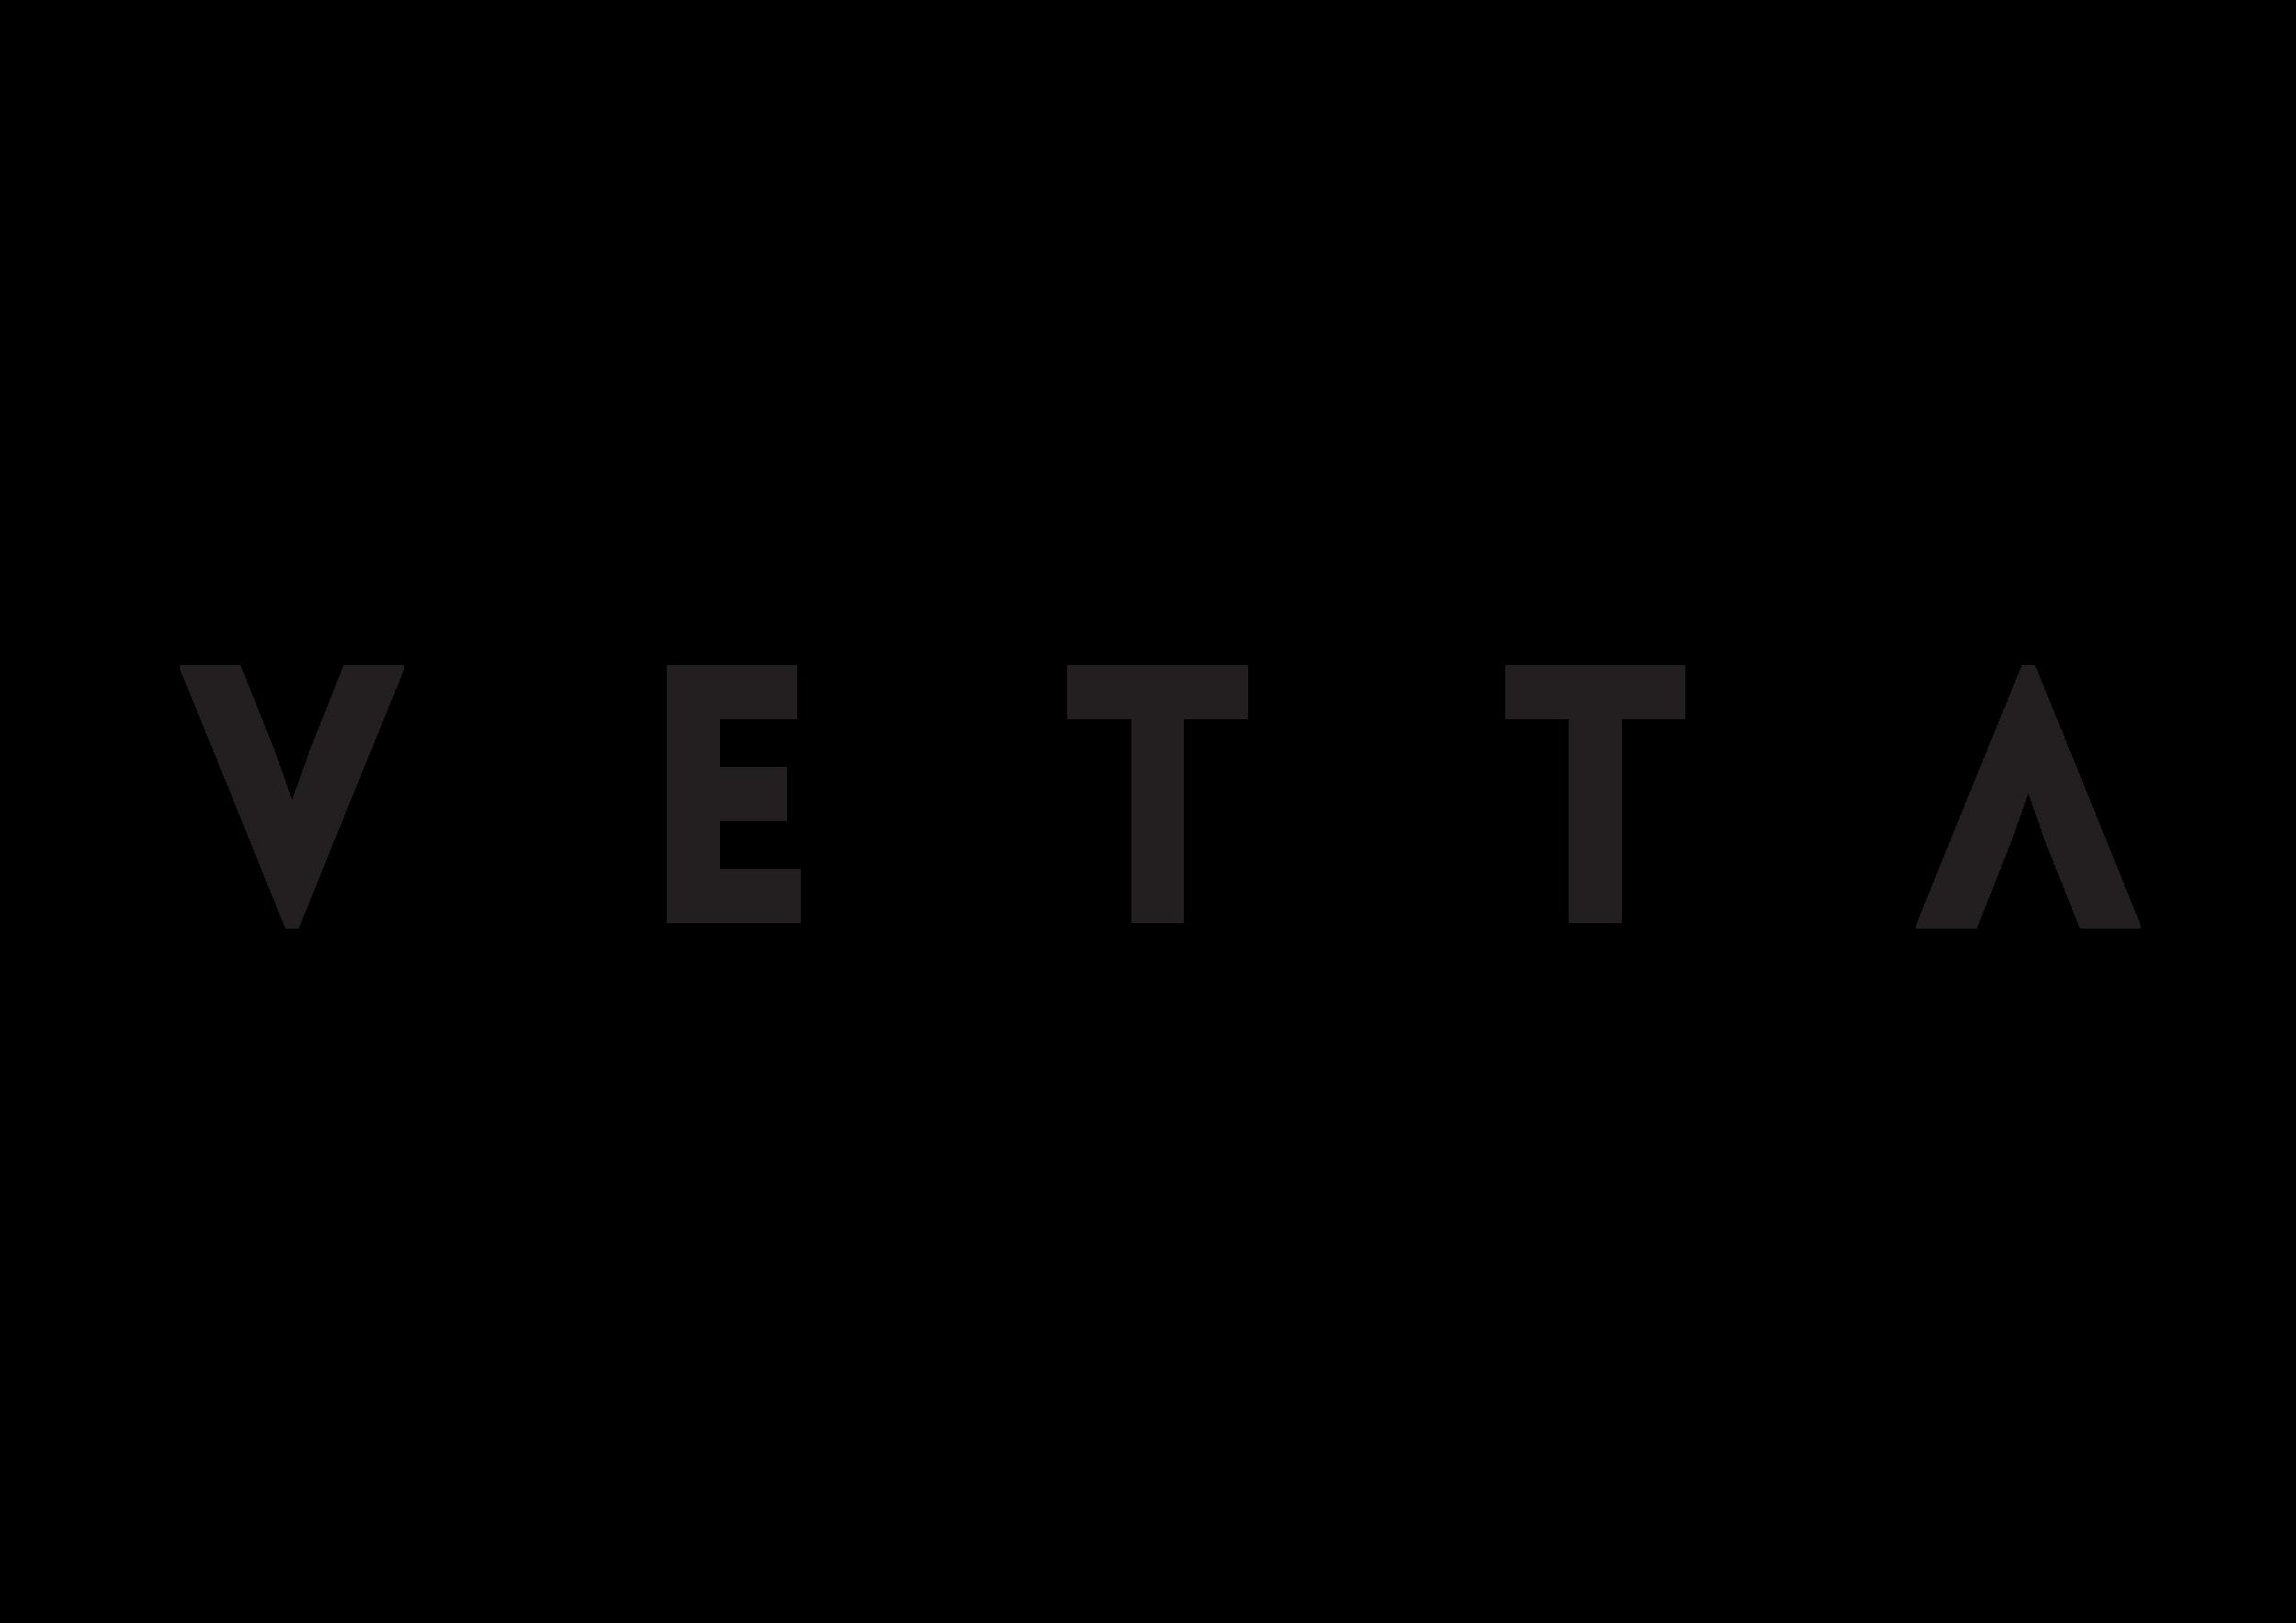 Logo-transparent-hi.png